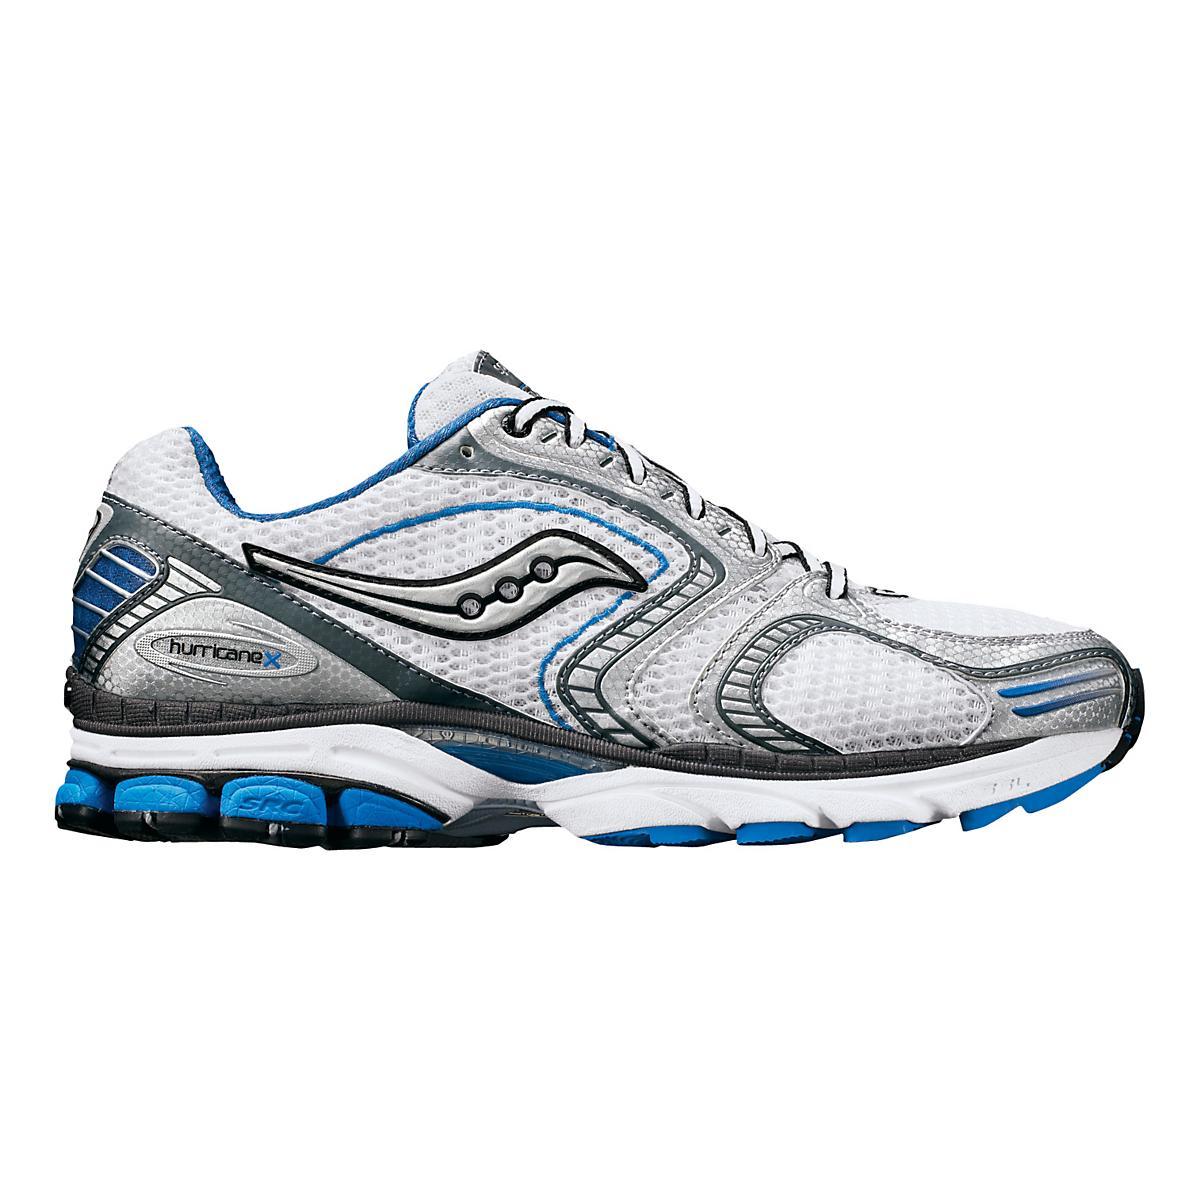 Saucony Progrid Hurricane 9 Men's Shoes White: Saucony